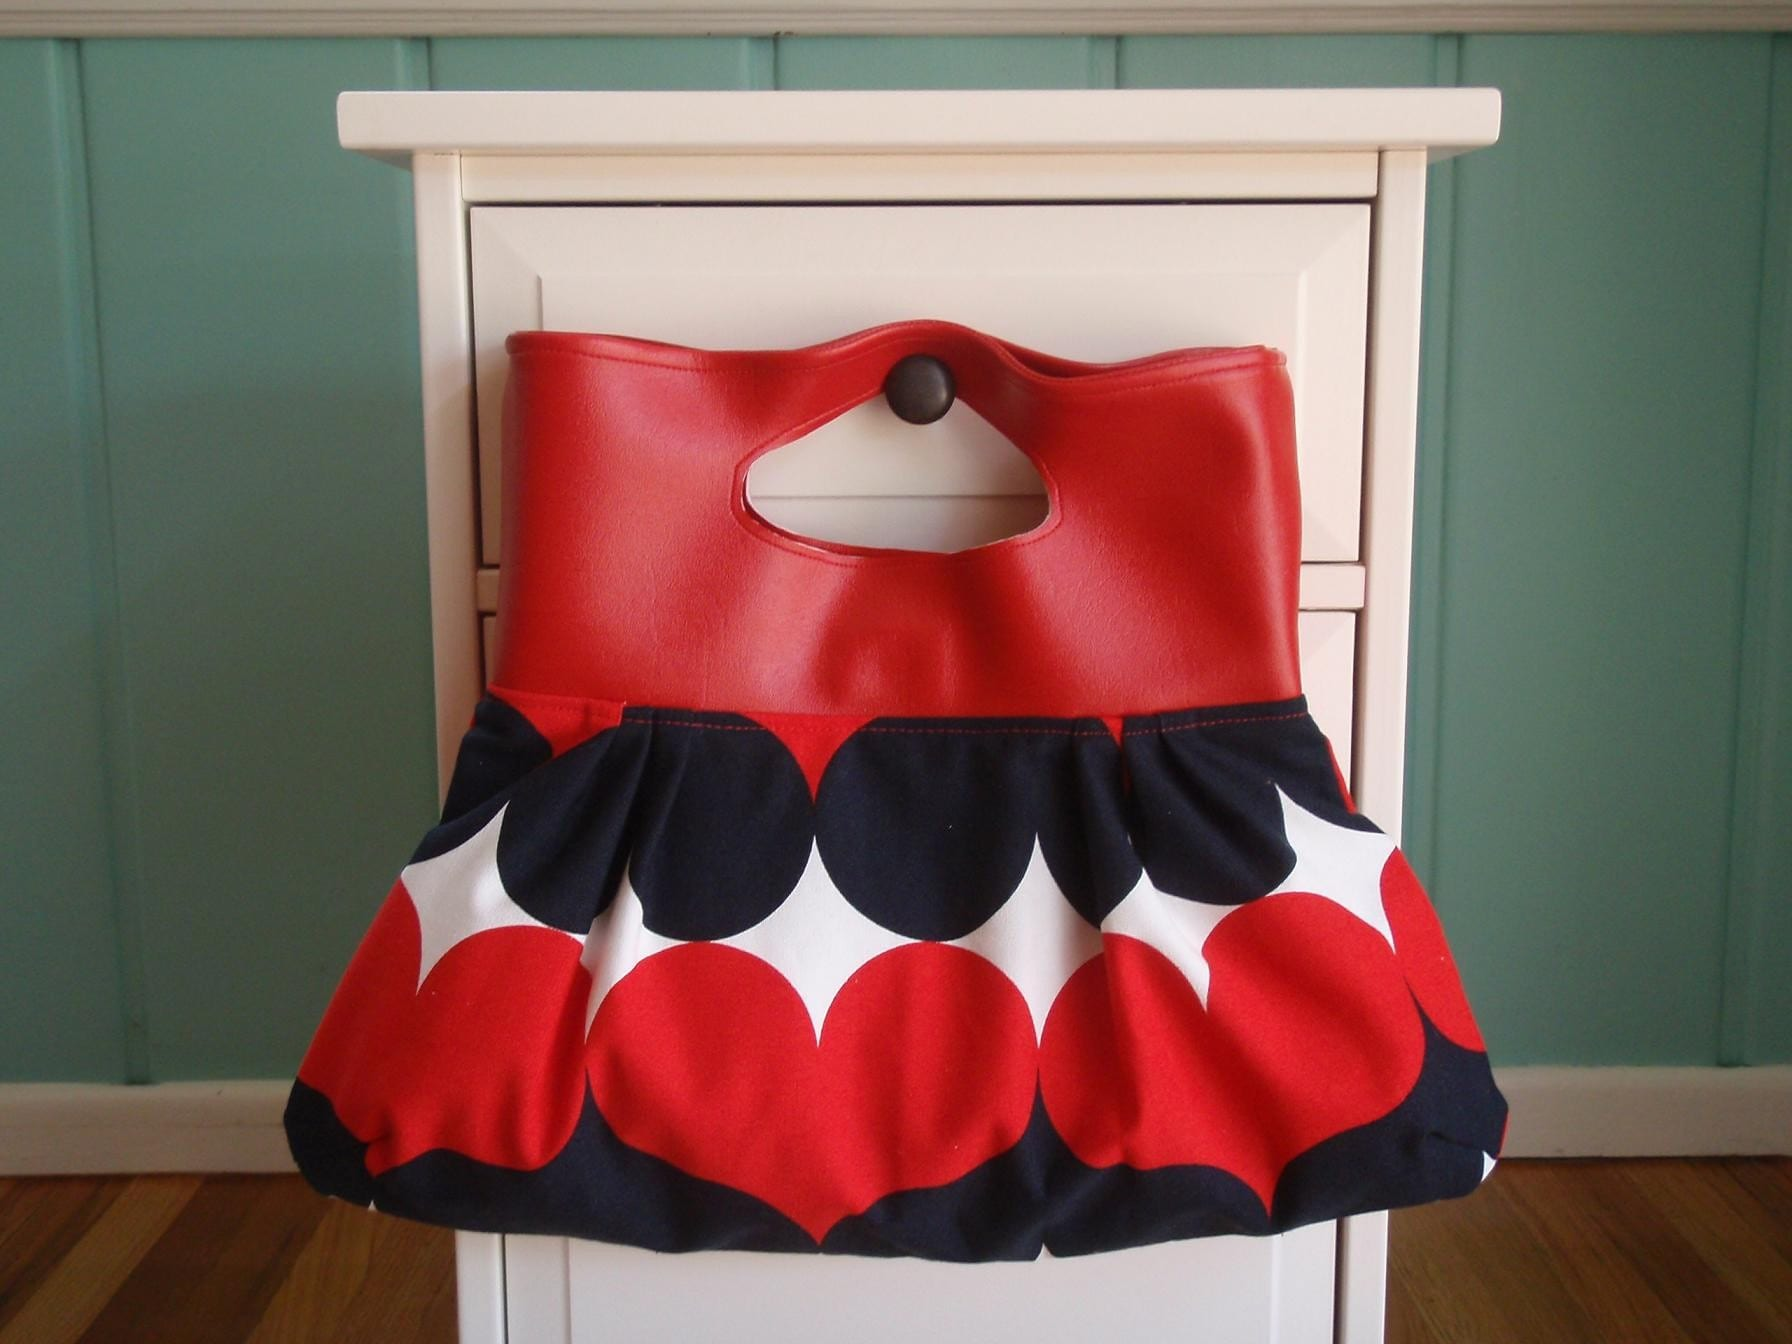 Etsy :: handsfullcreations :: The Peggy Sue Handbag - Queen of Hearts Print from etsy.com